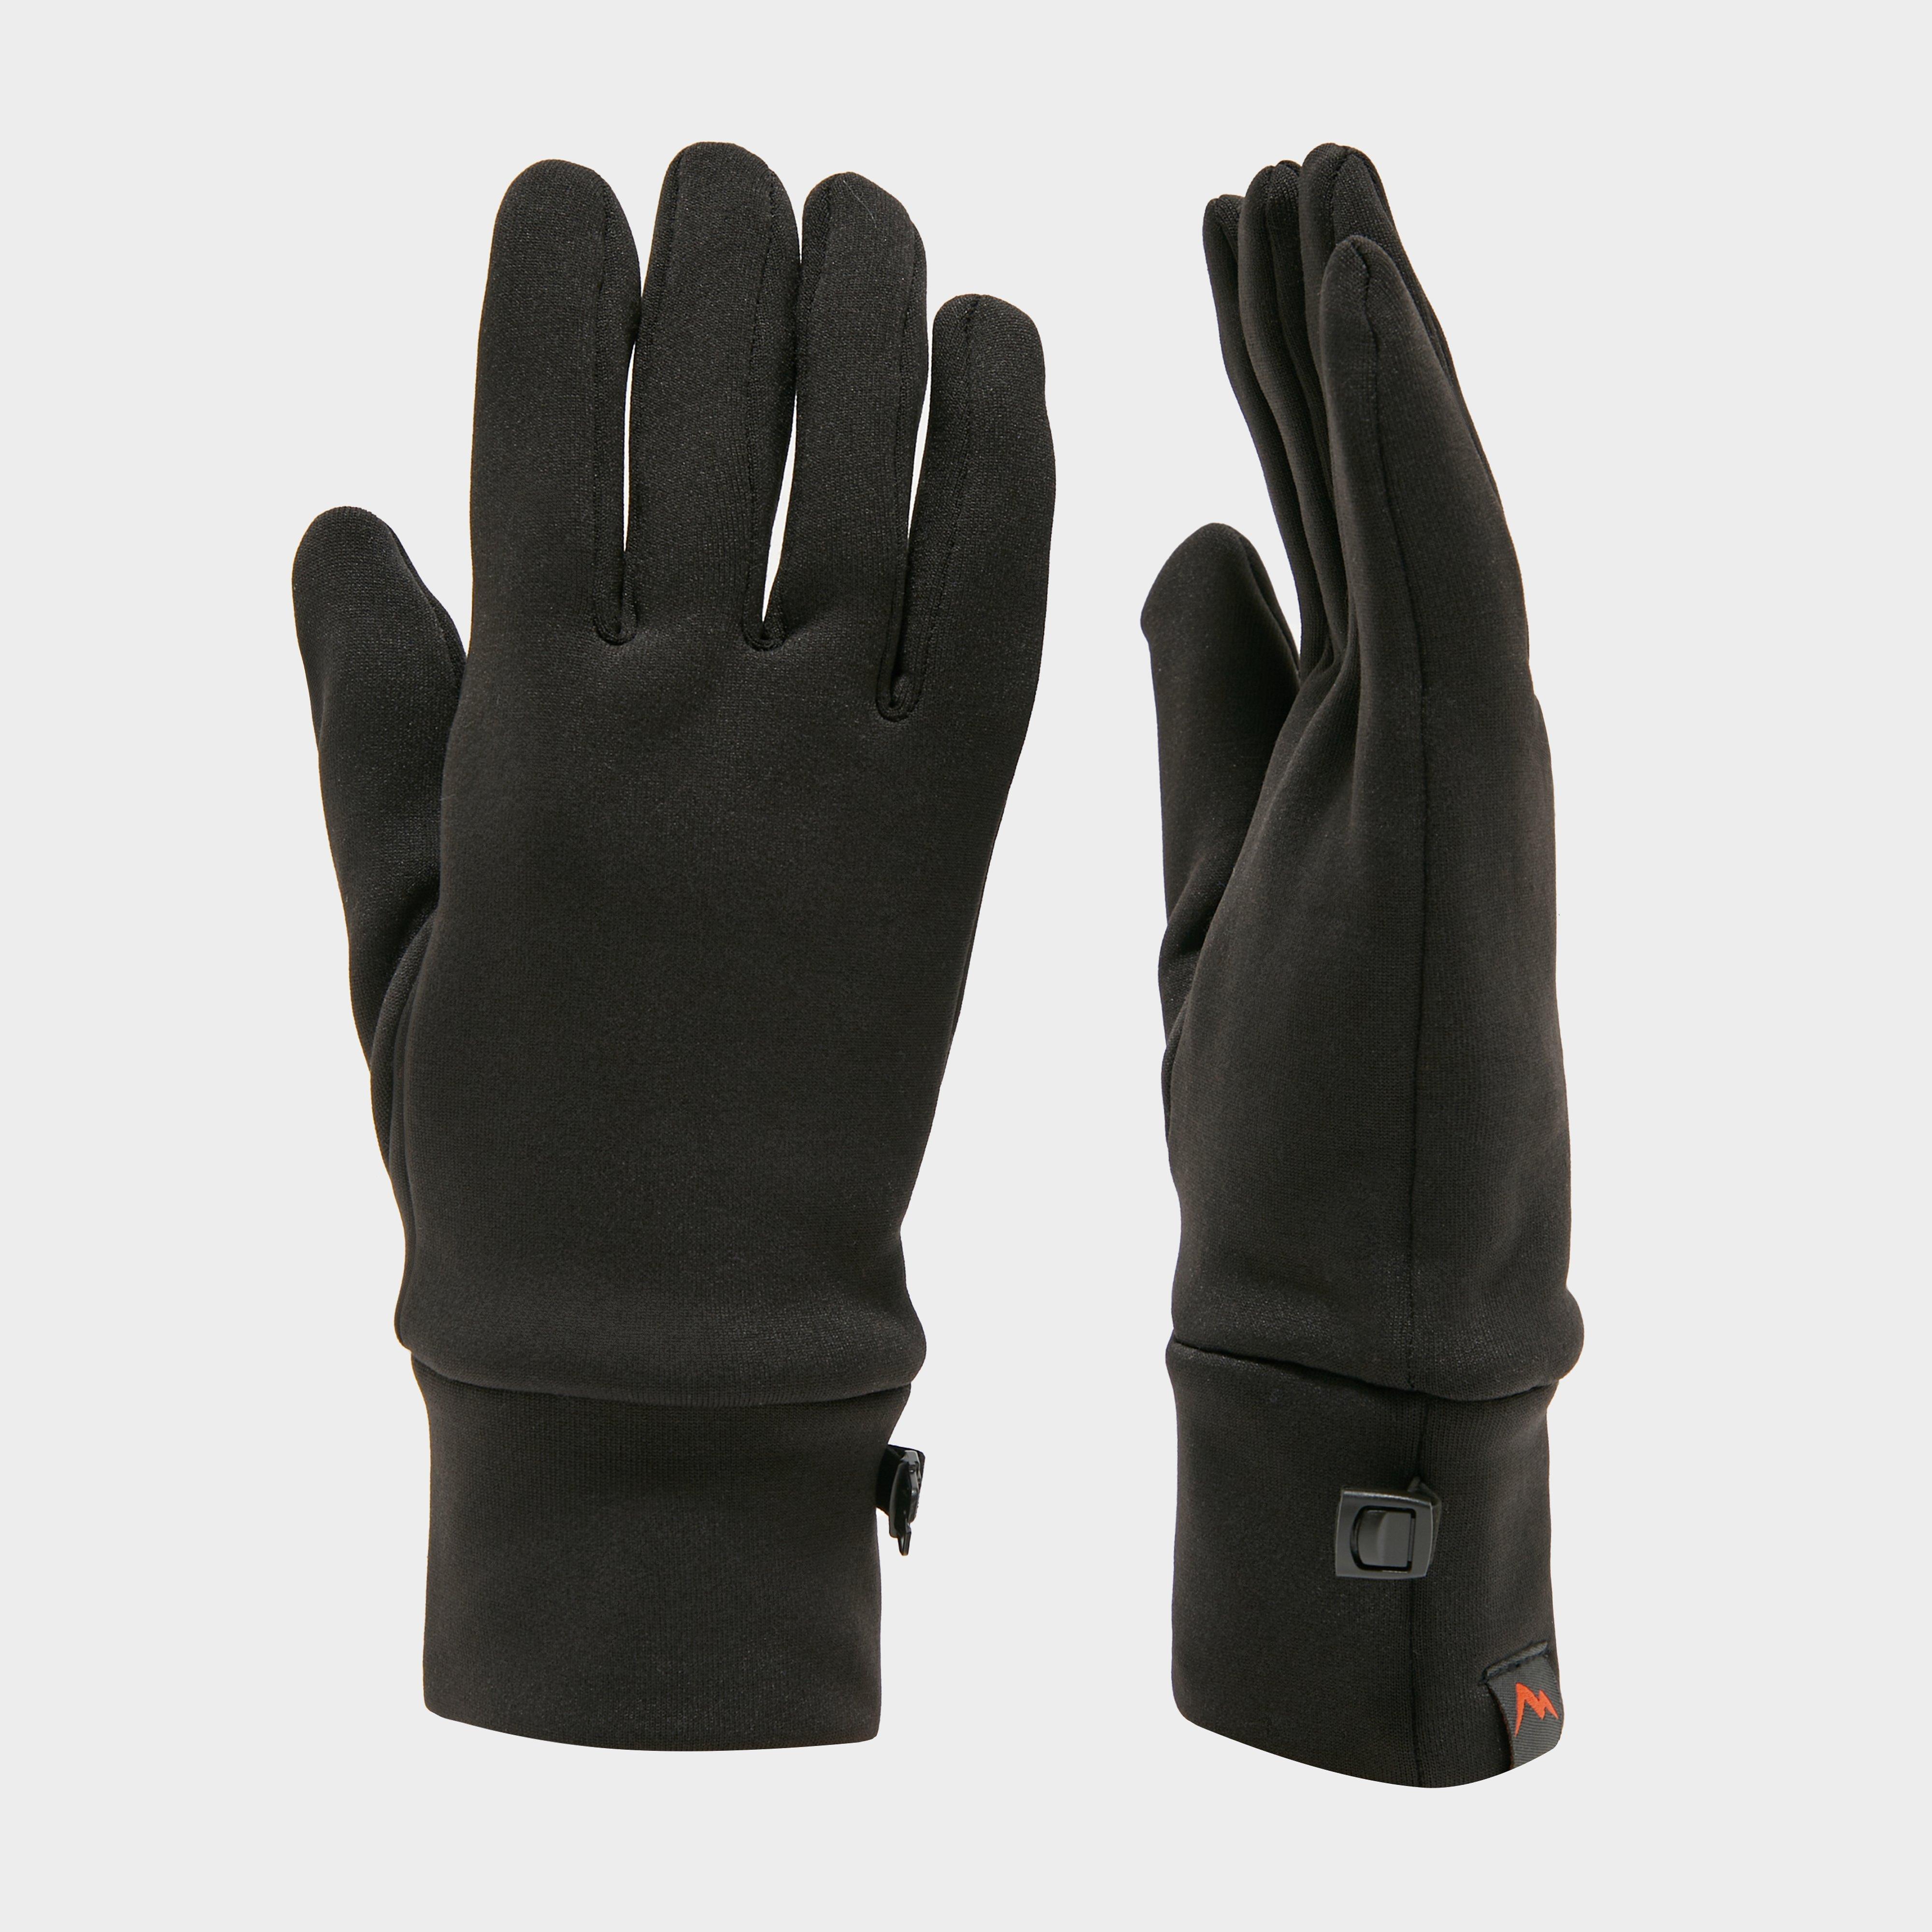 Peter Storm 6 Way Stretch Gloves - Black, Black